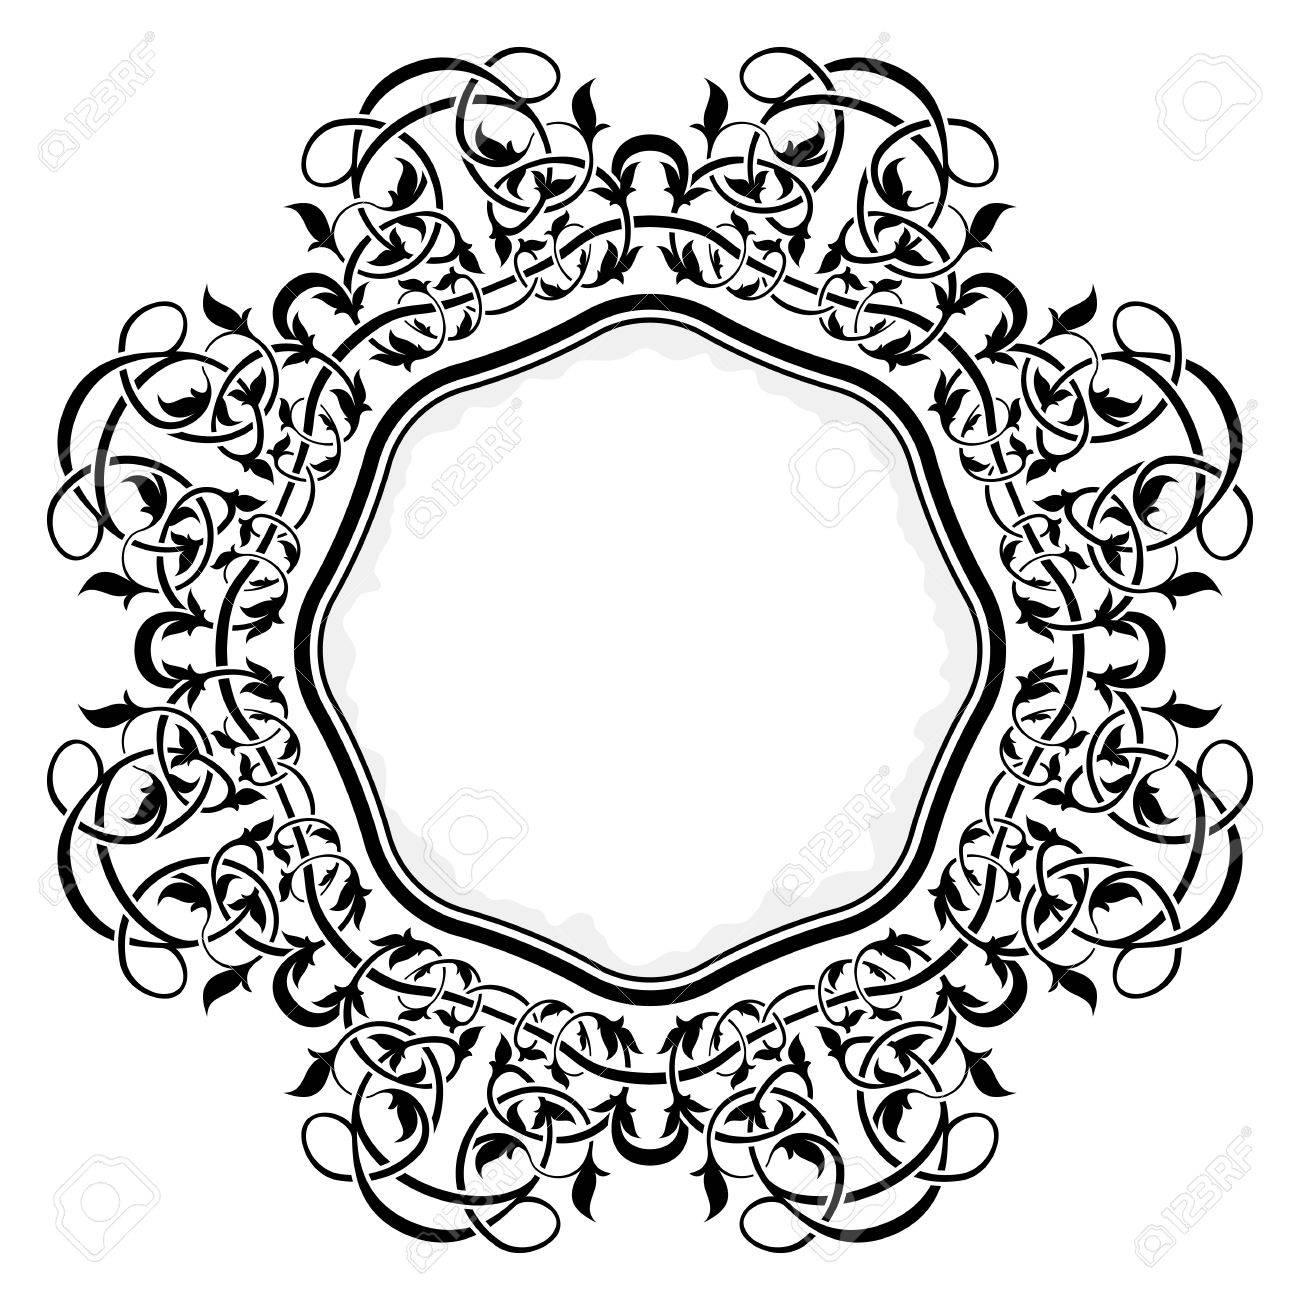 Black frame with ornamental border Stock Vector - 12128362